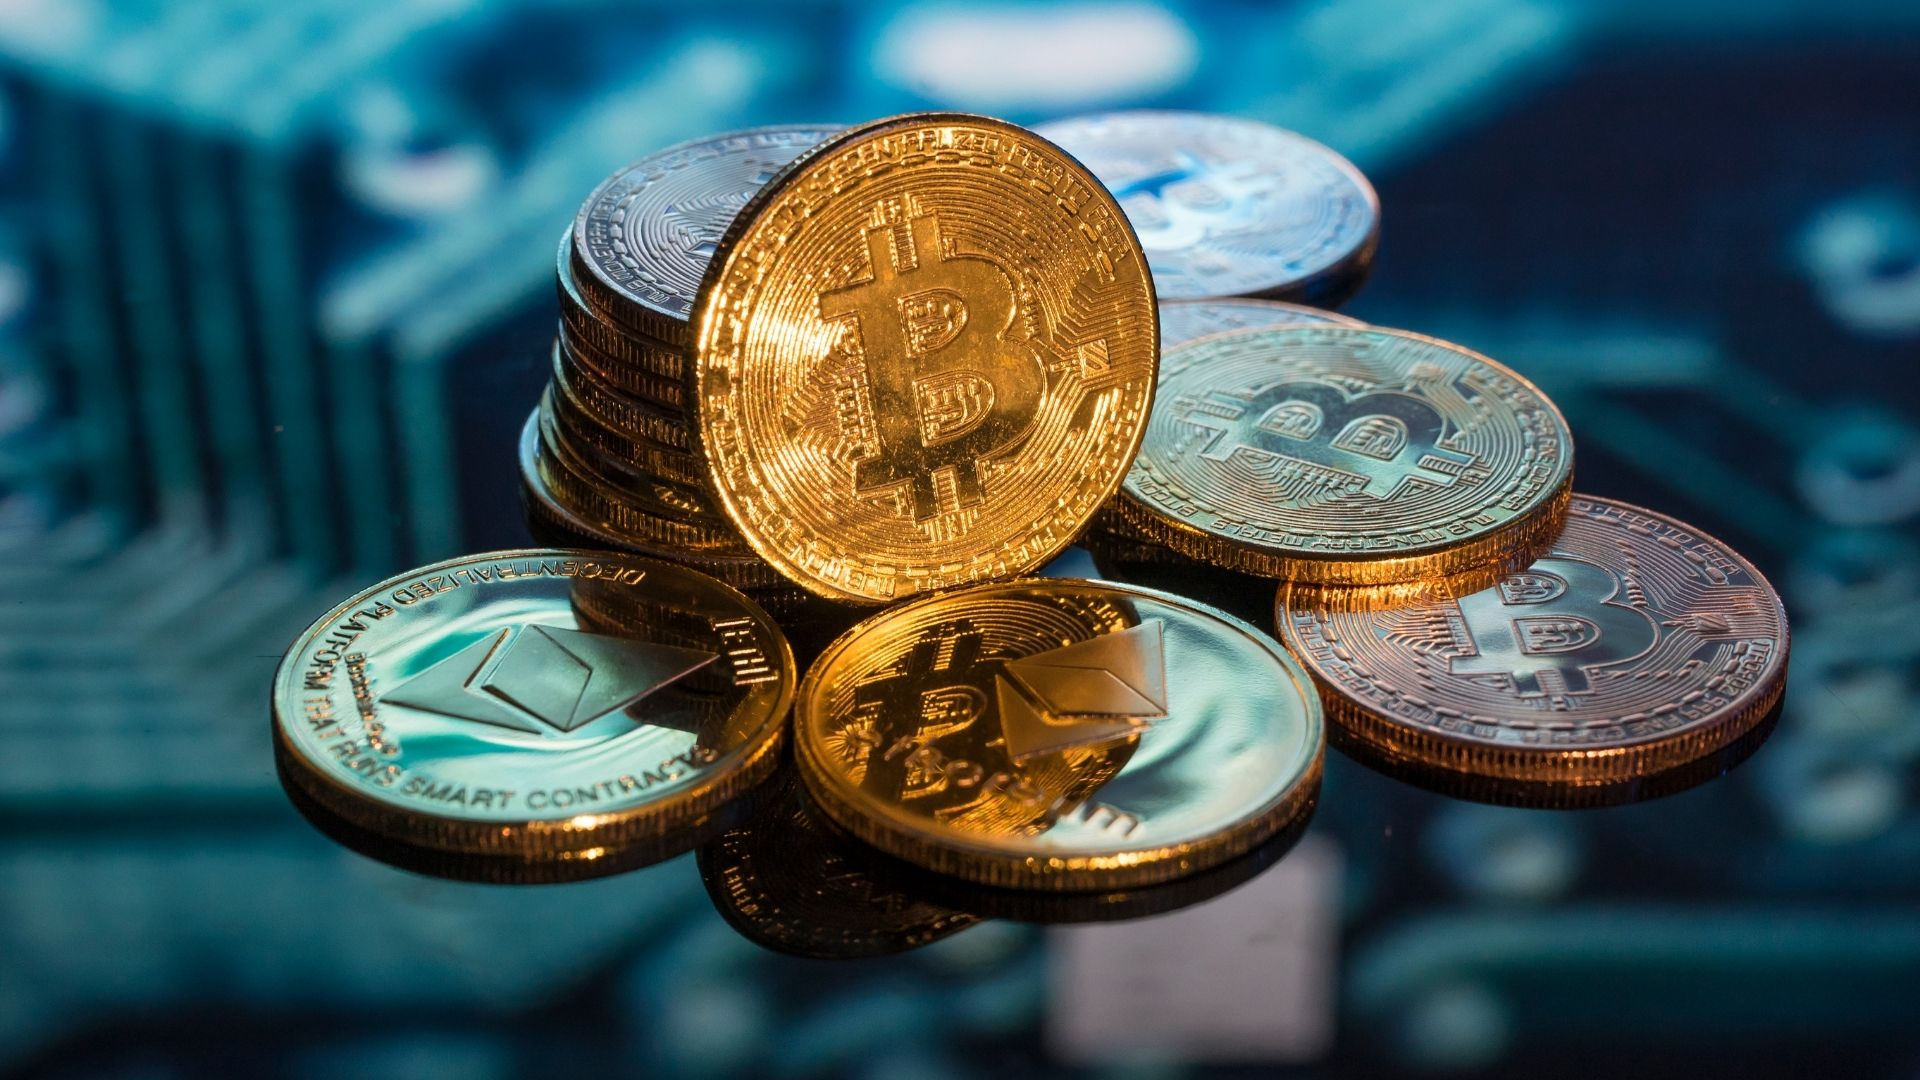 Crypto Custody via US Banks – What's in Store? / Can Banks Really Custody Crypto? 1